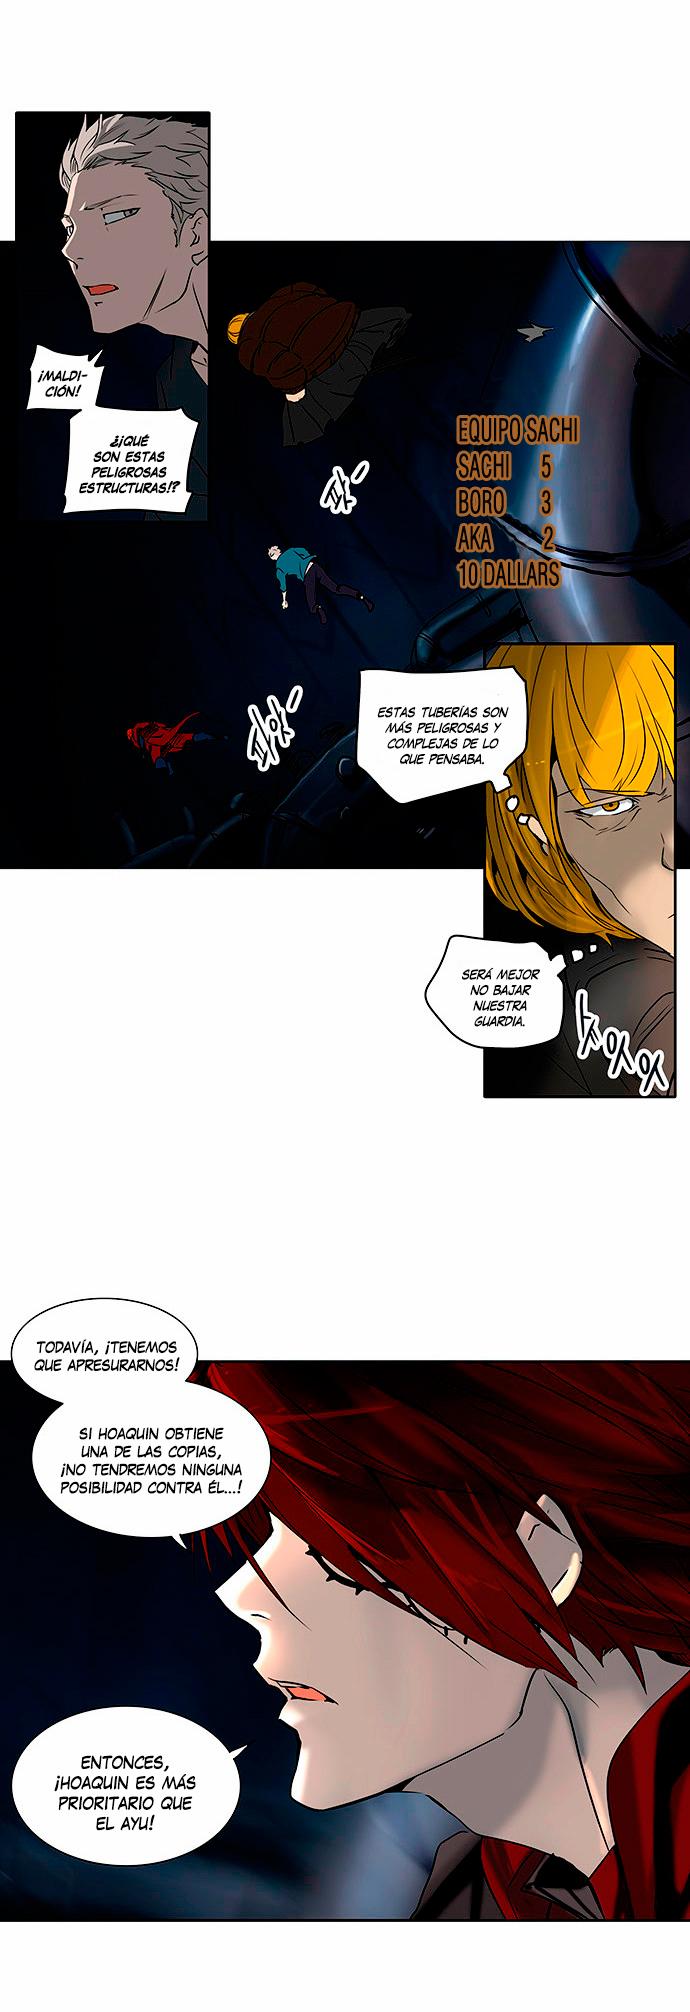 http://c5.ninemanga.com/es_manga/21/149/424362/78ade5b560946211ce63652717b37aea.jpg Page 6